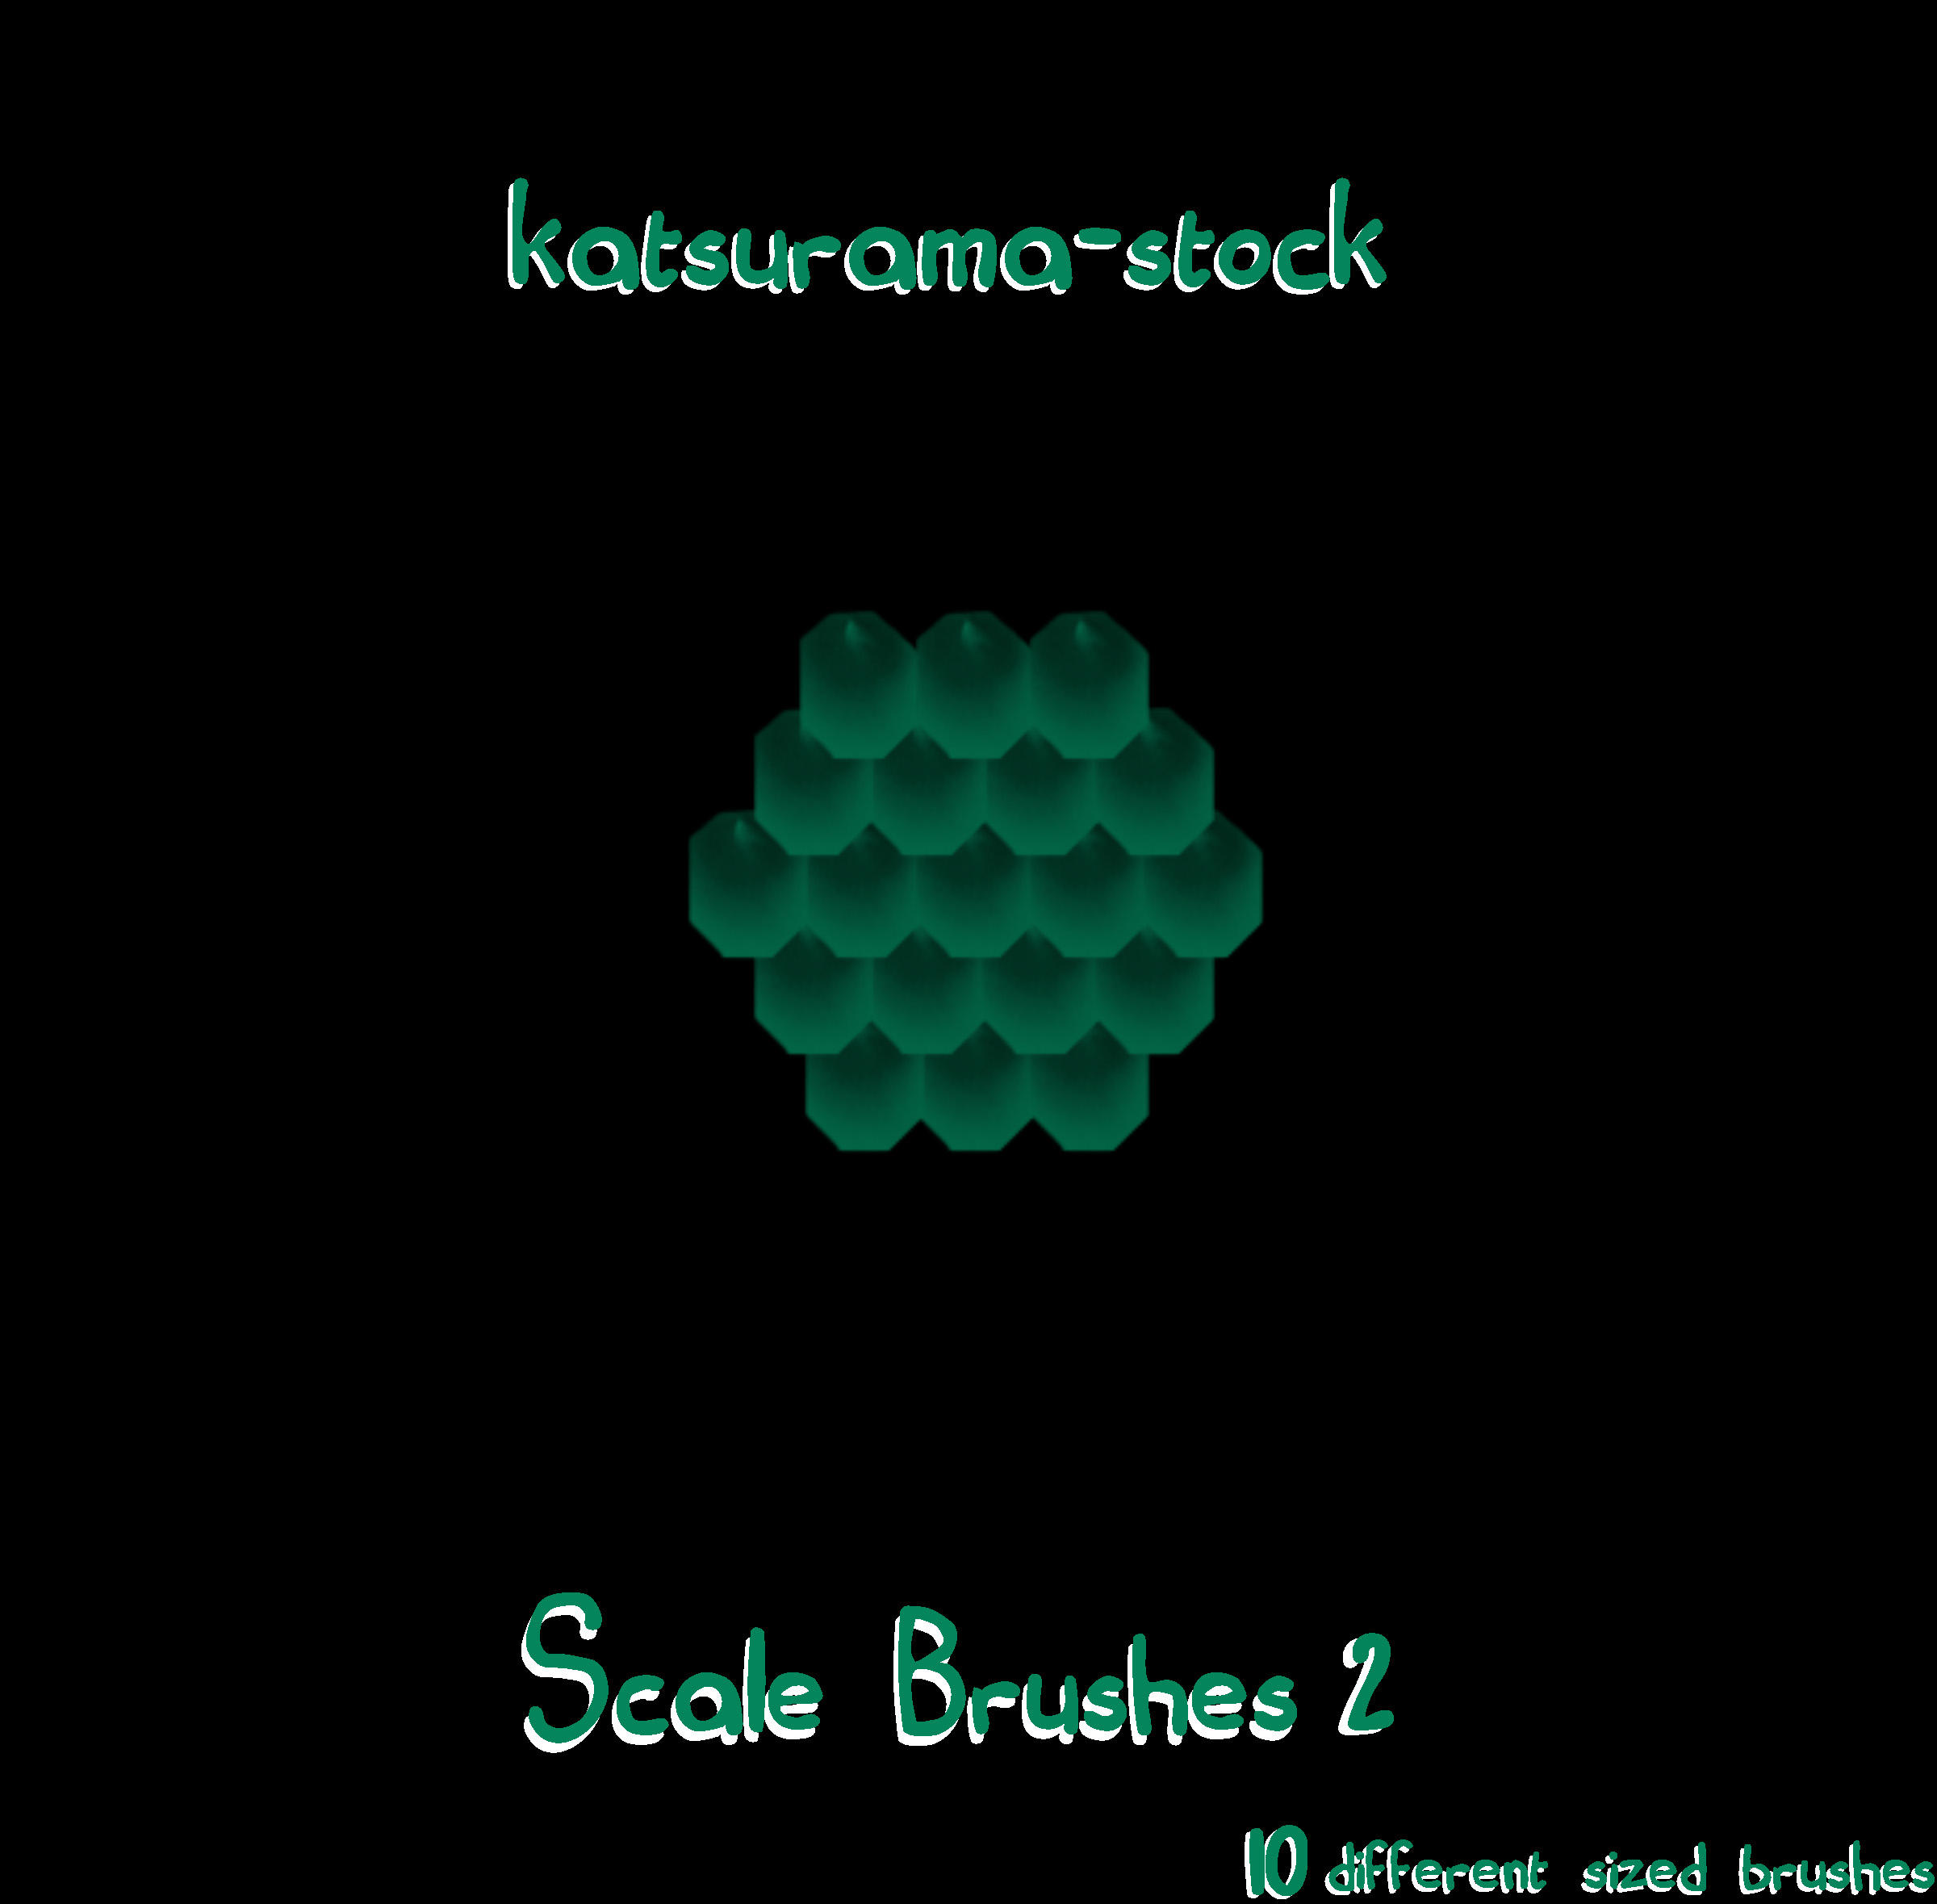 Scale Brushes 2 by katsurama-stock